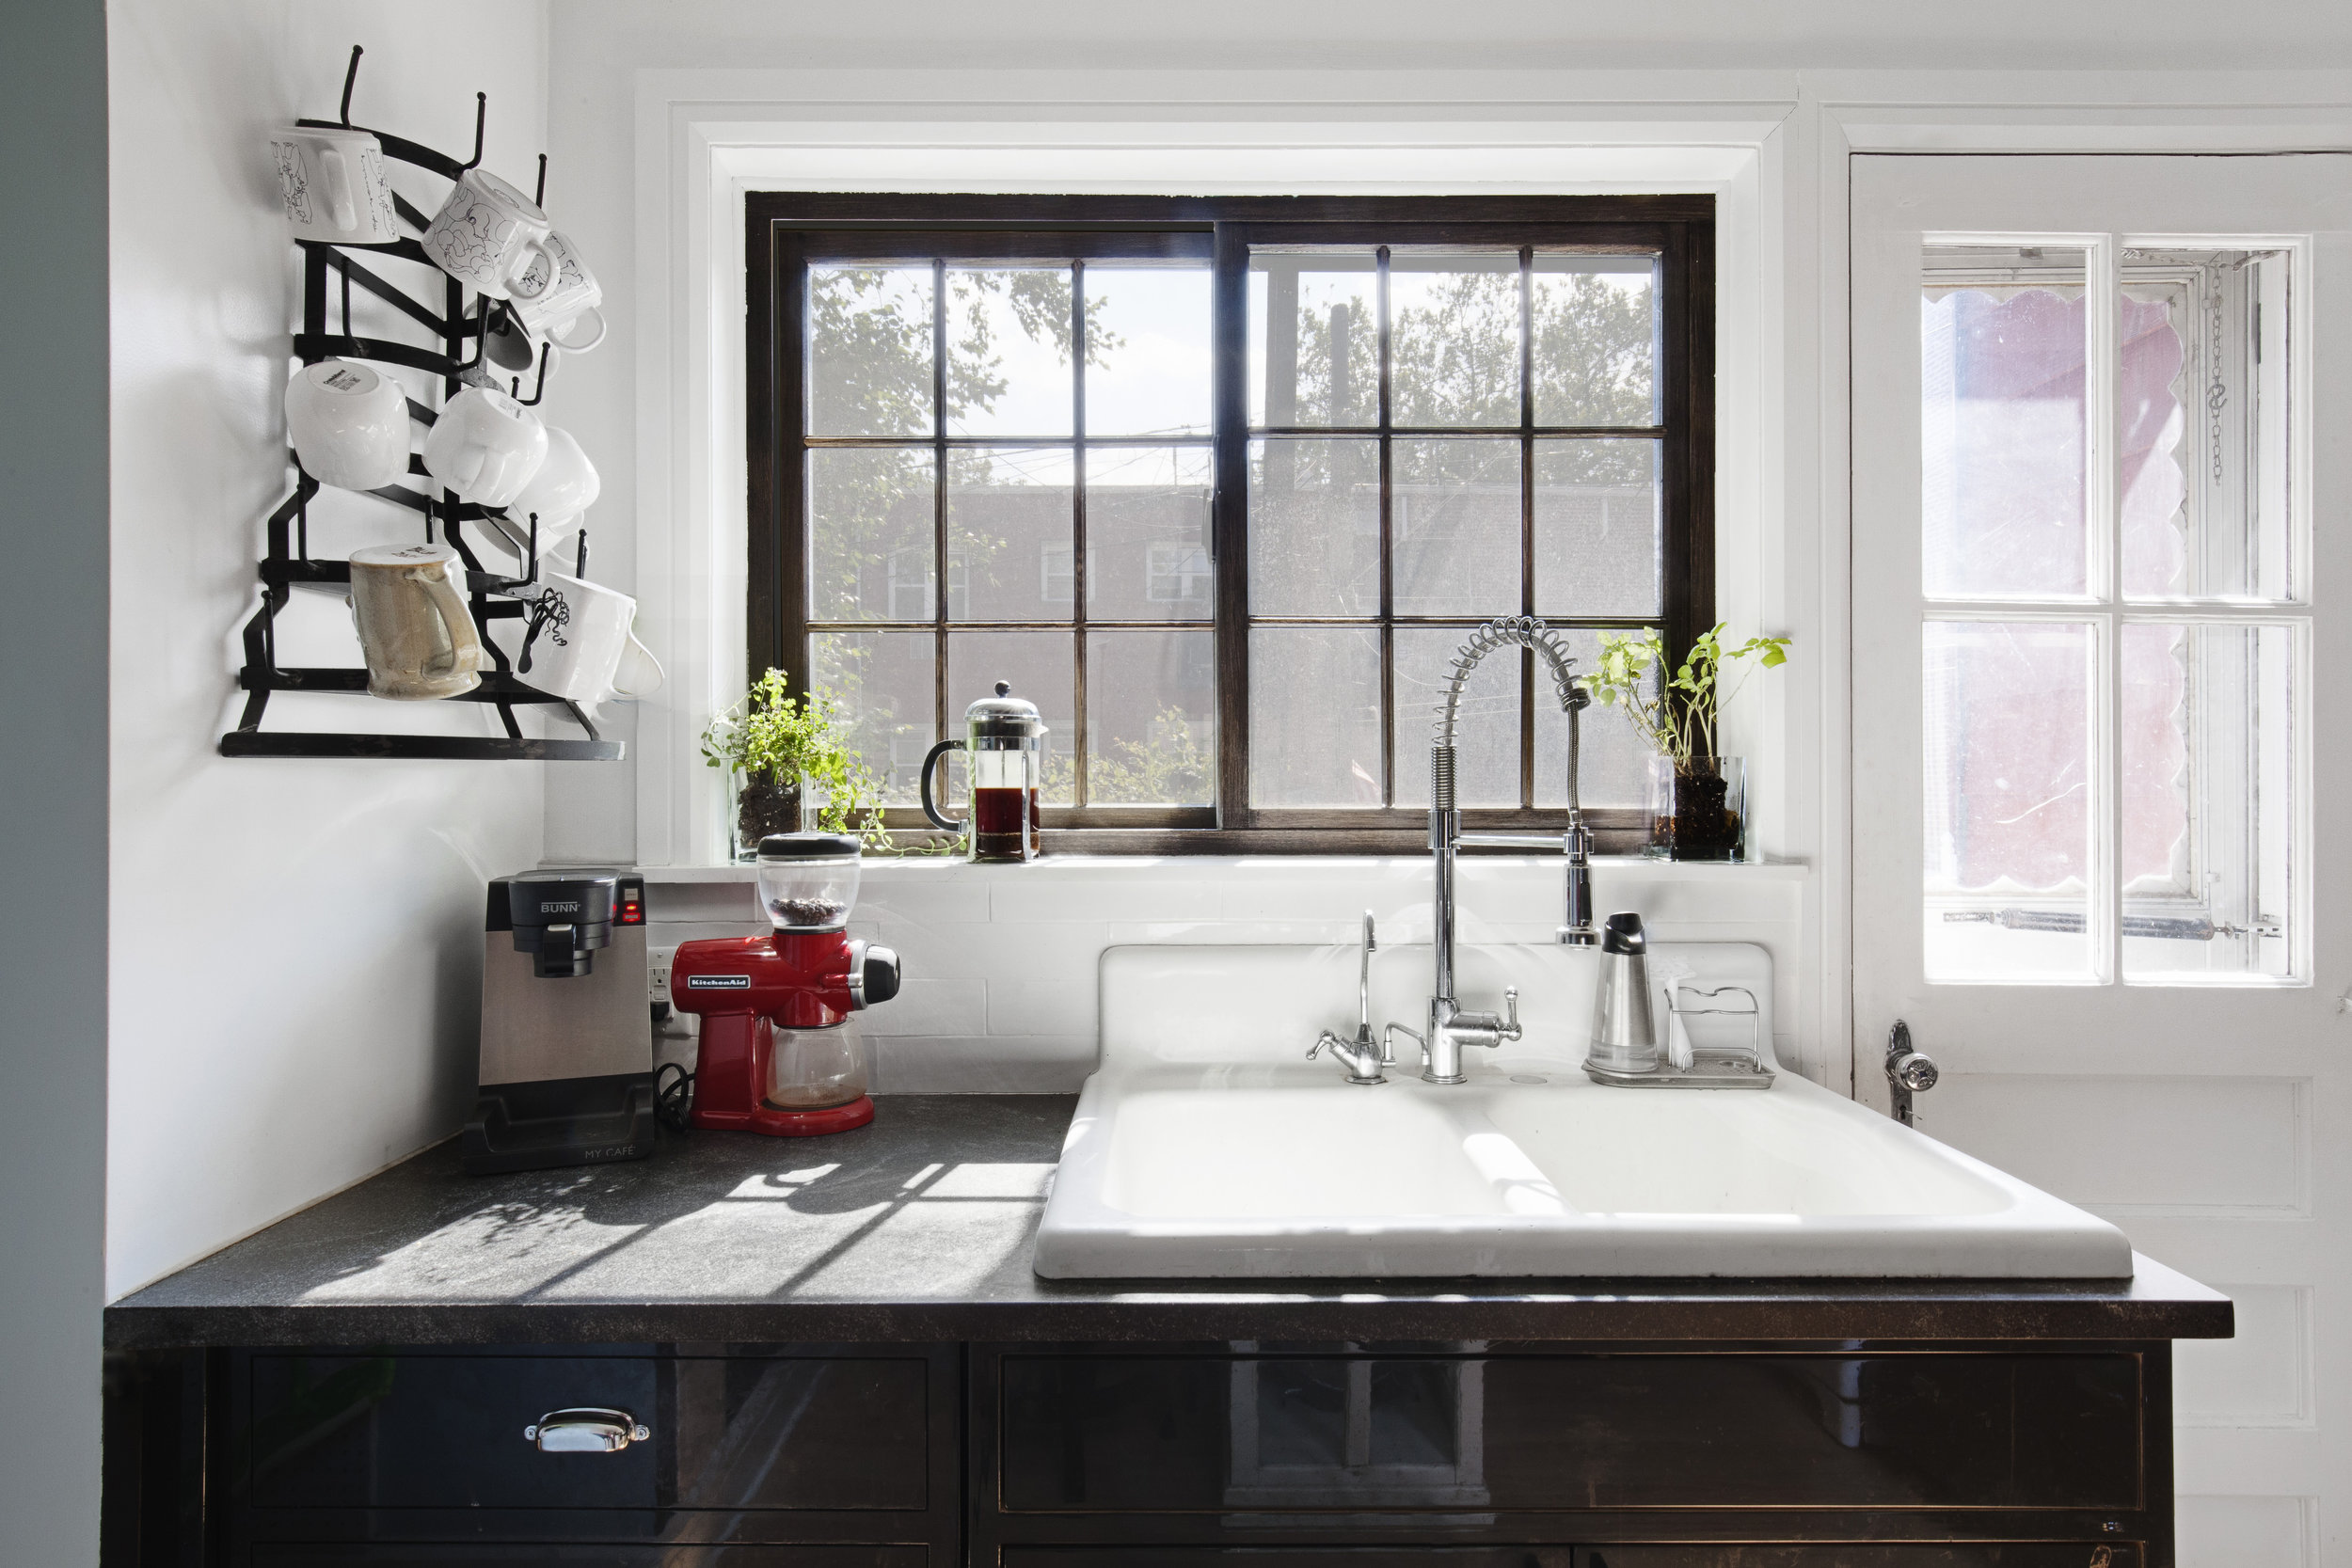 Sweeten - kitchen - sink.jpg